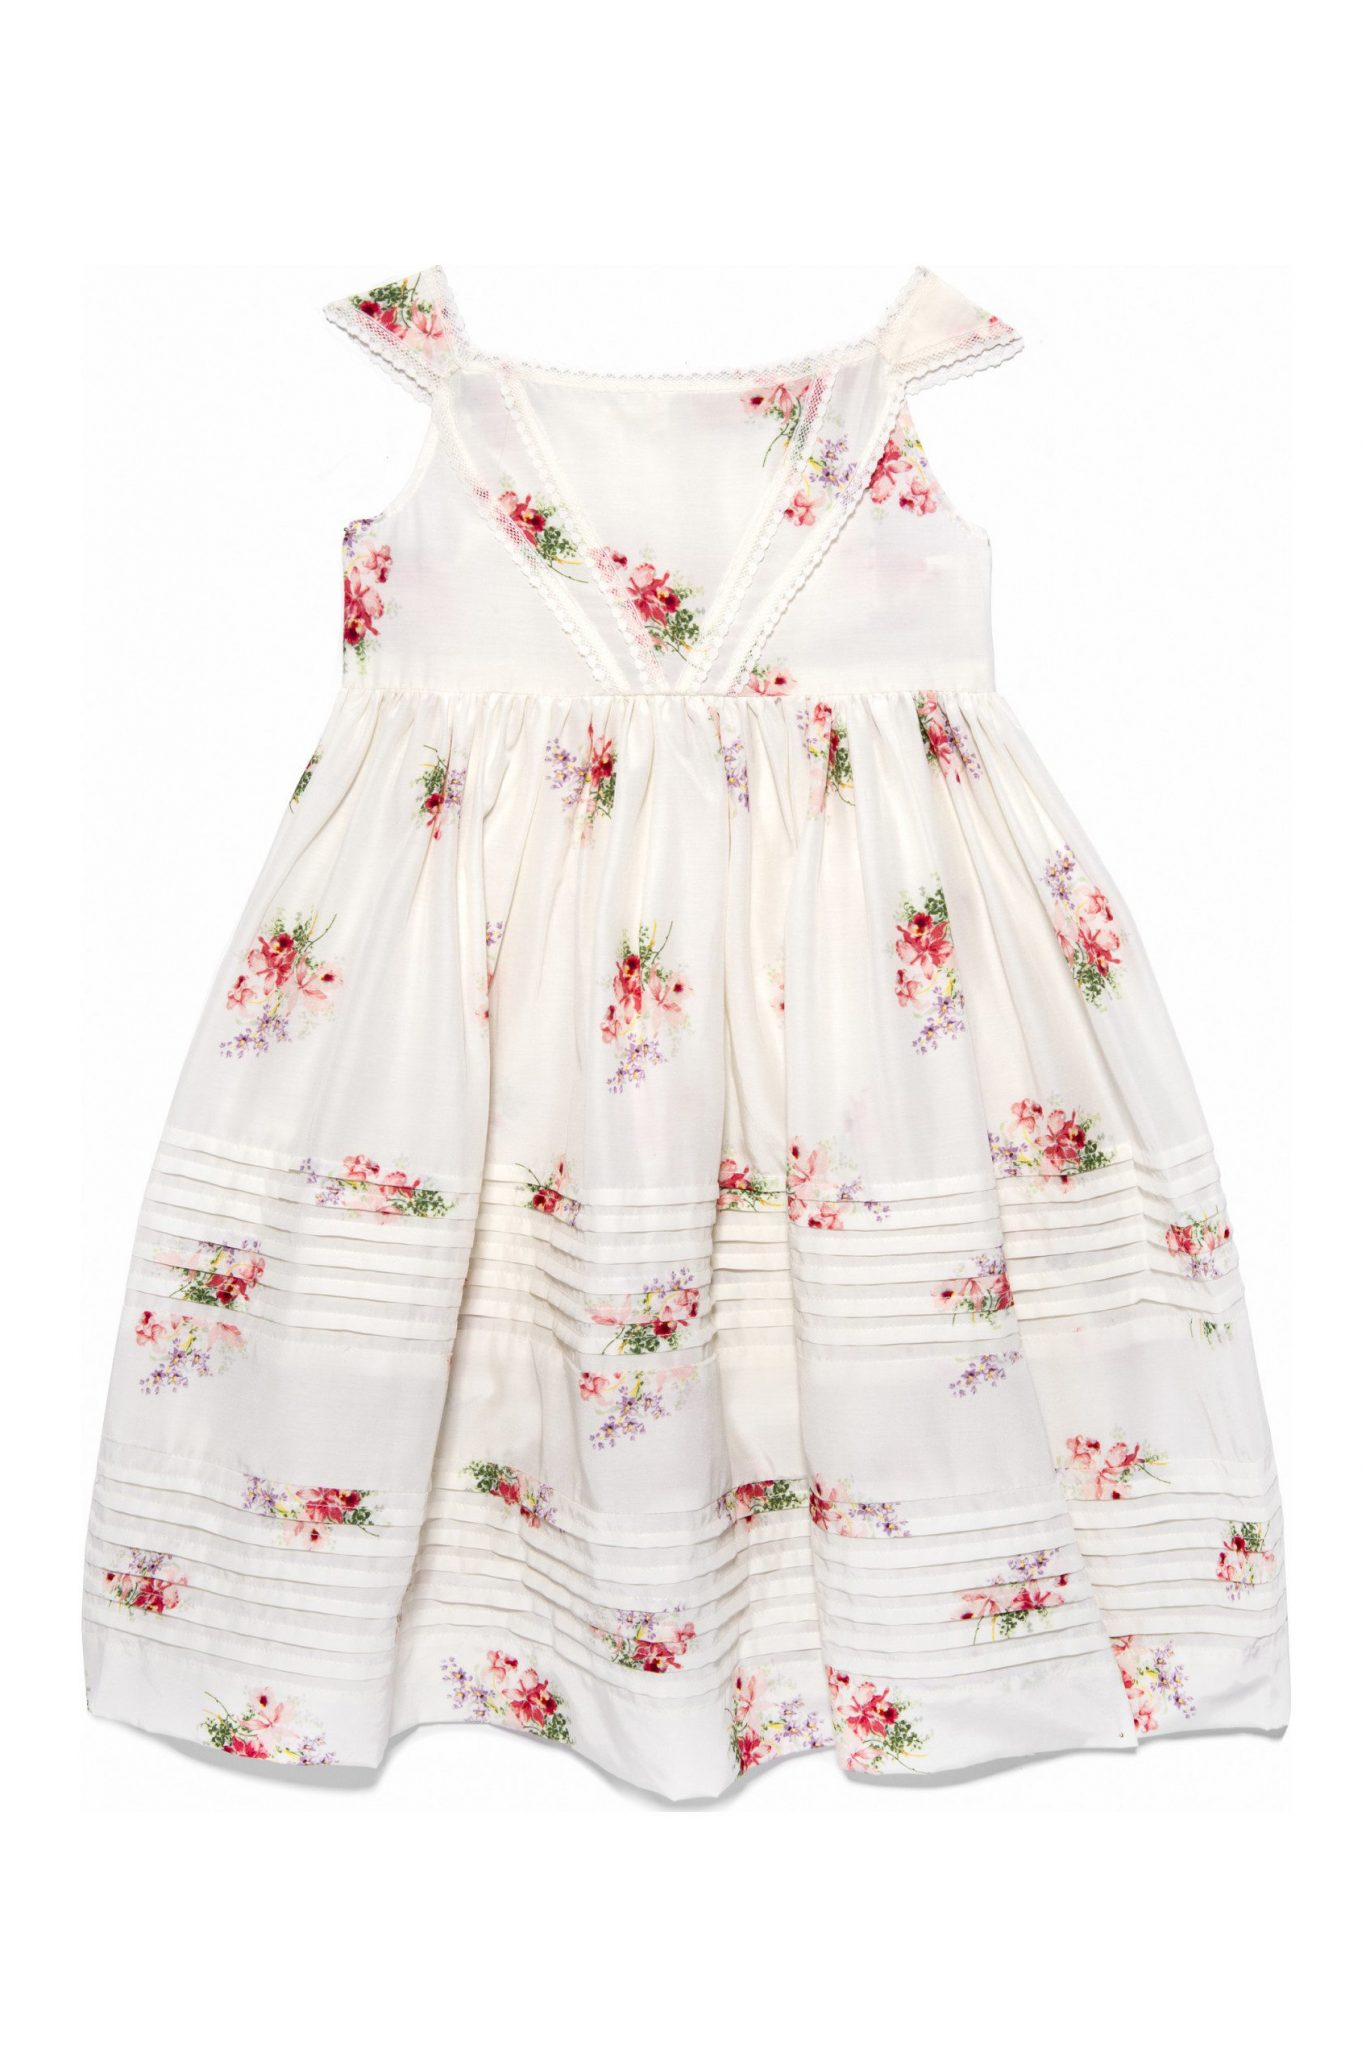 los-encajeros 10 Summer Wedding Dresses Fit For A Flower Girl